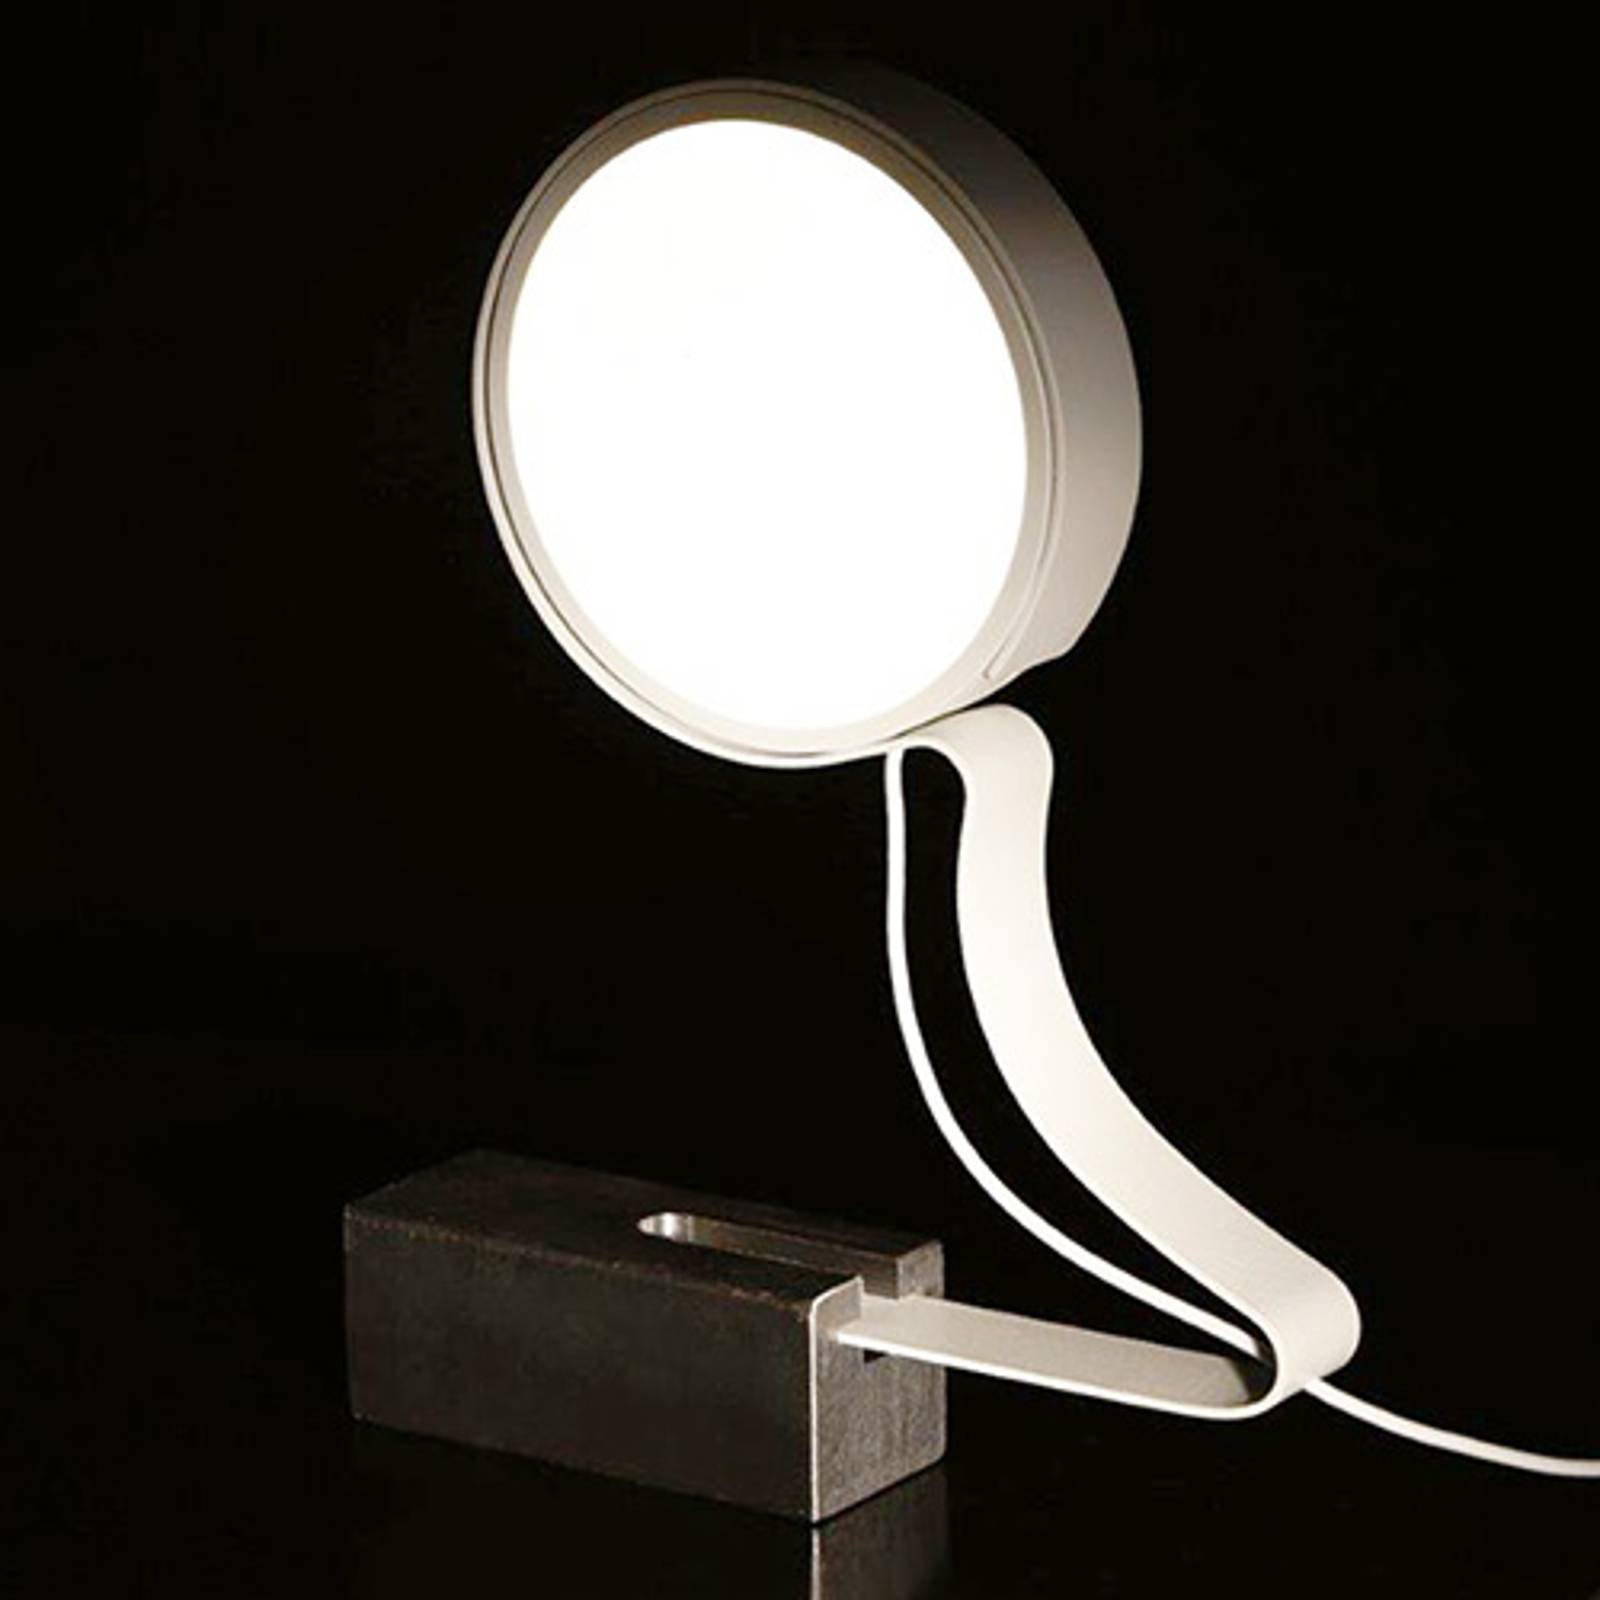 Bordlampe DND Profile med LED-lys, hvit